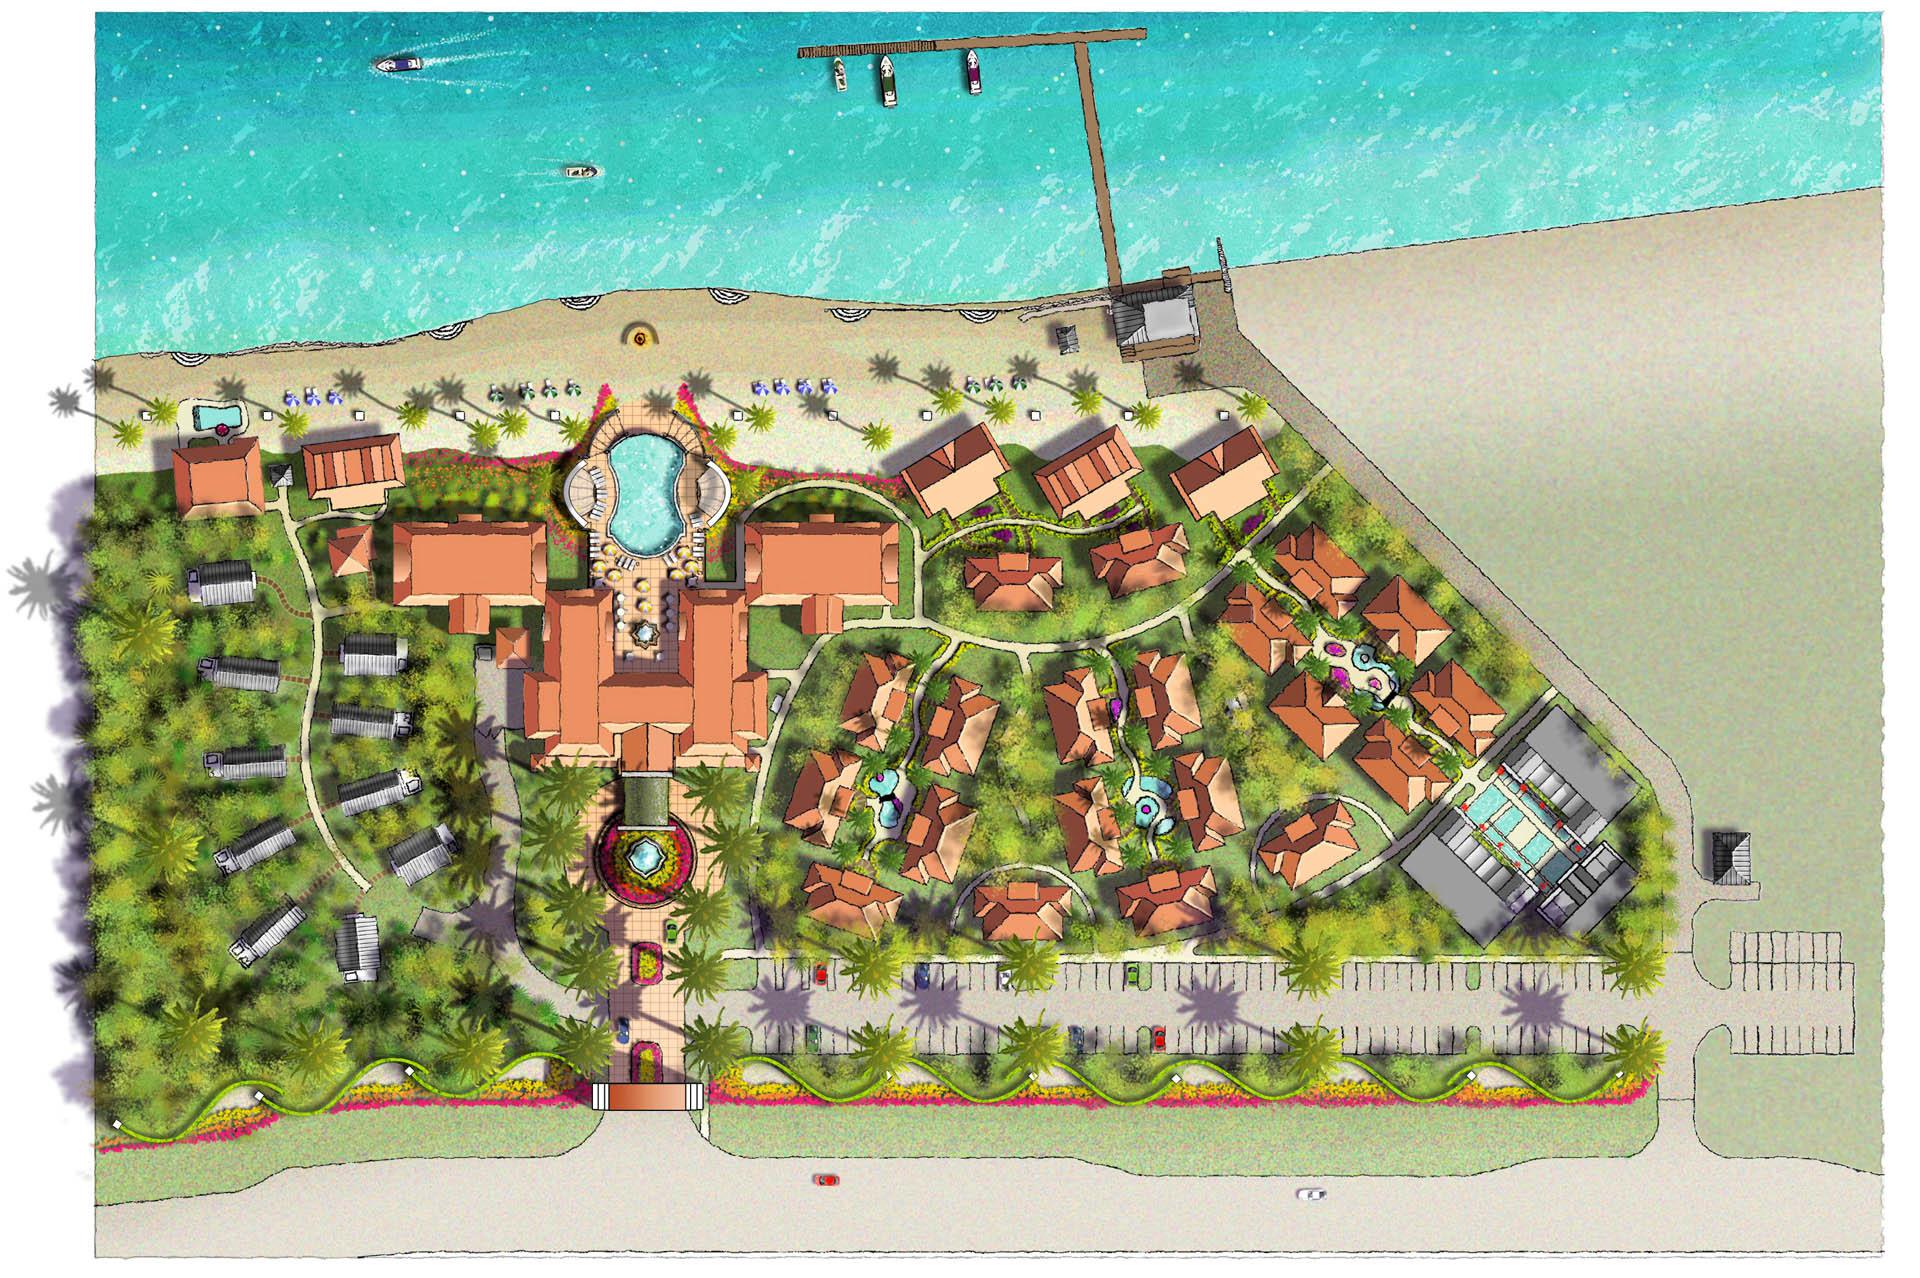 Playa Cristal Site Plan